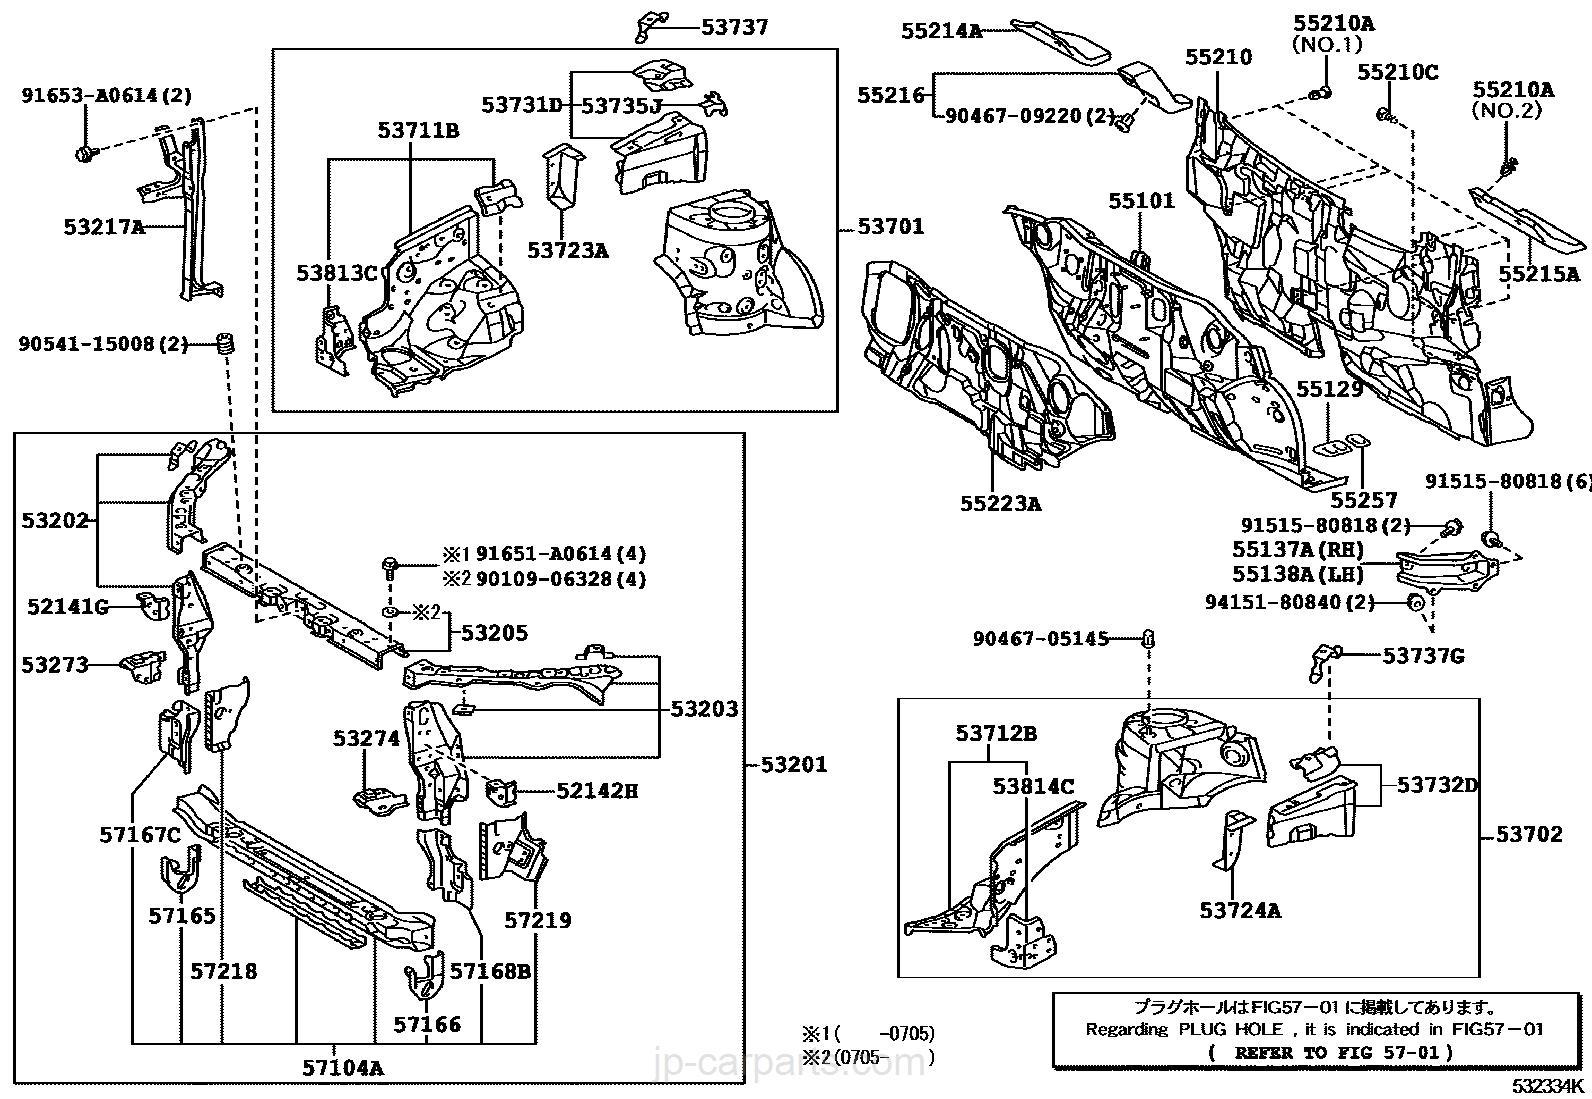 Toyota Corolla Repair Manual: Side mudguard sub–assy lh